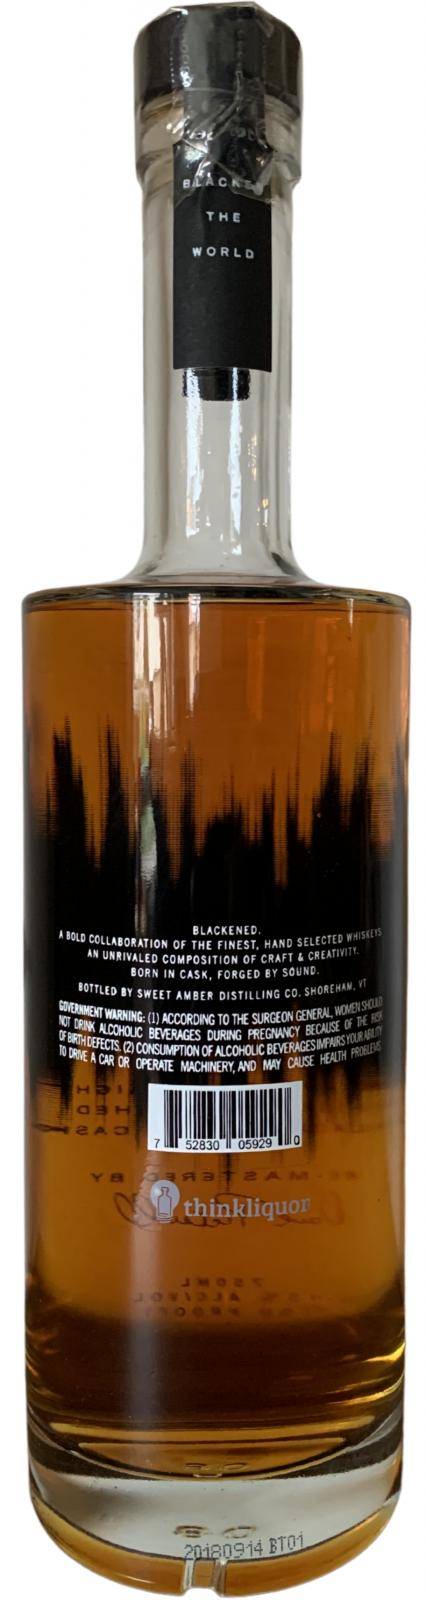 Blackened Batch 085